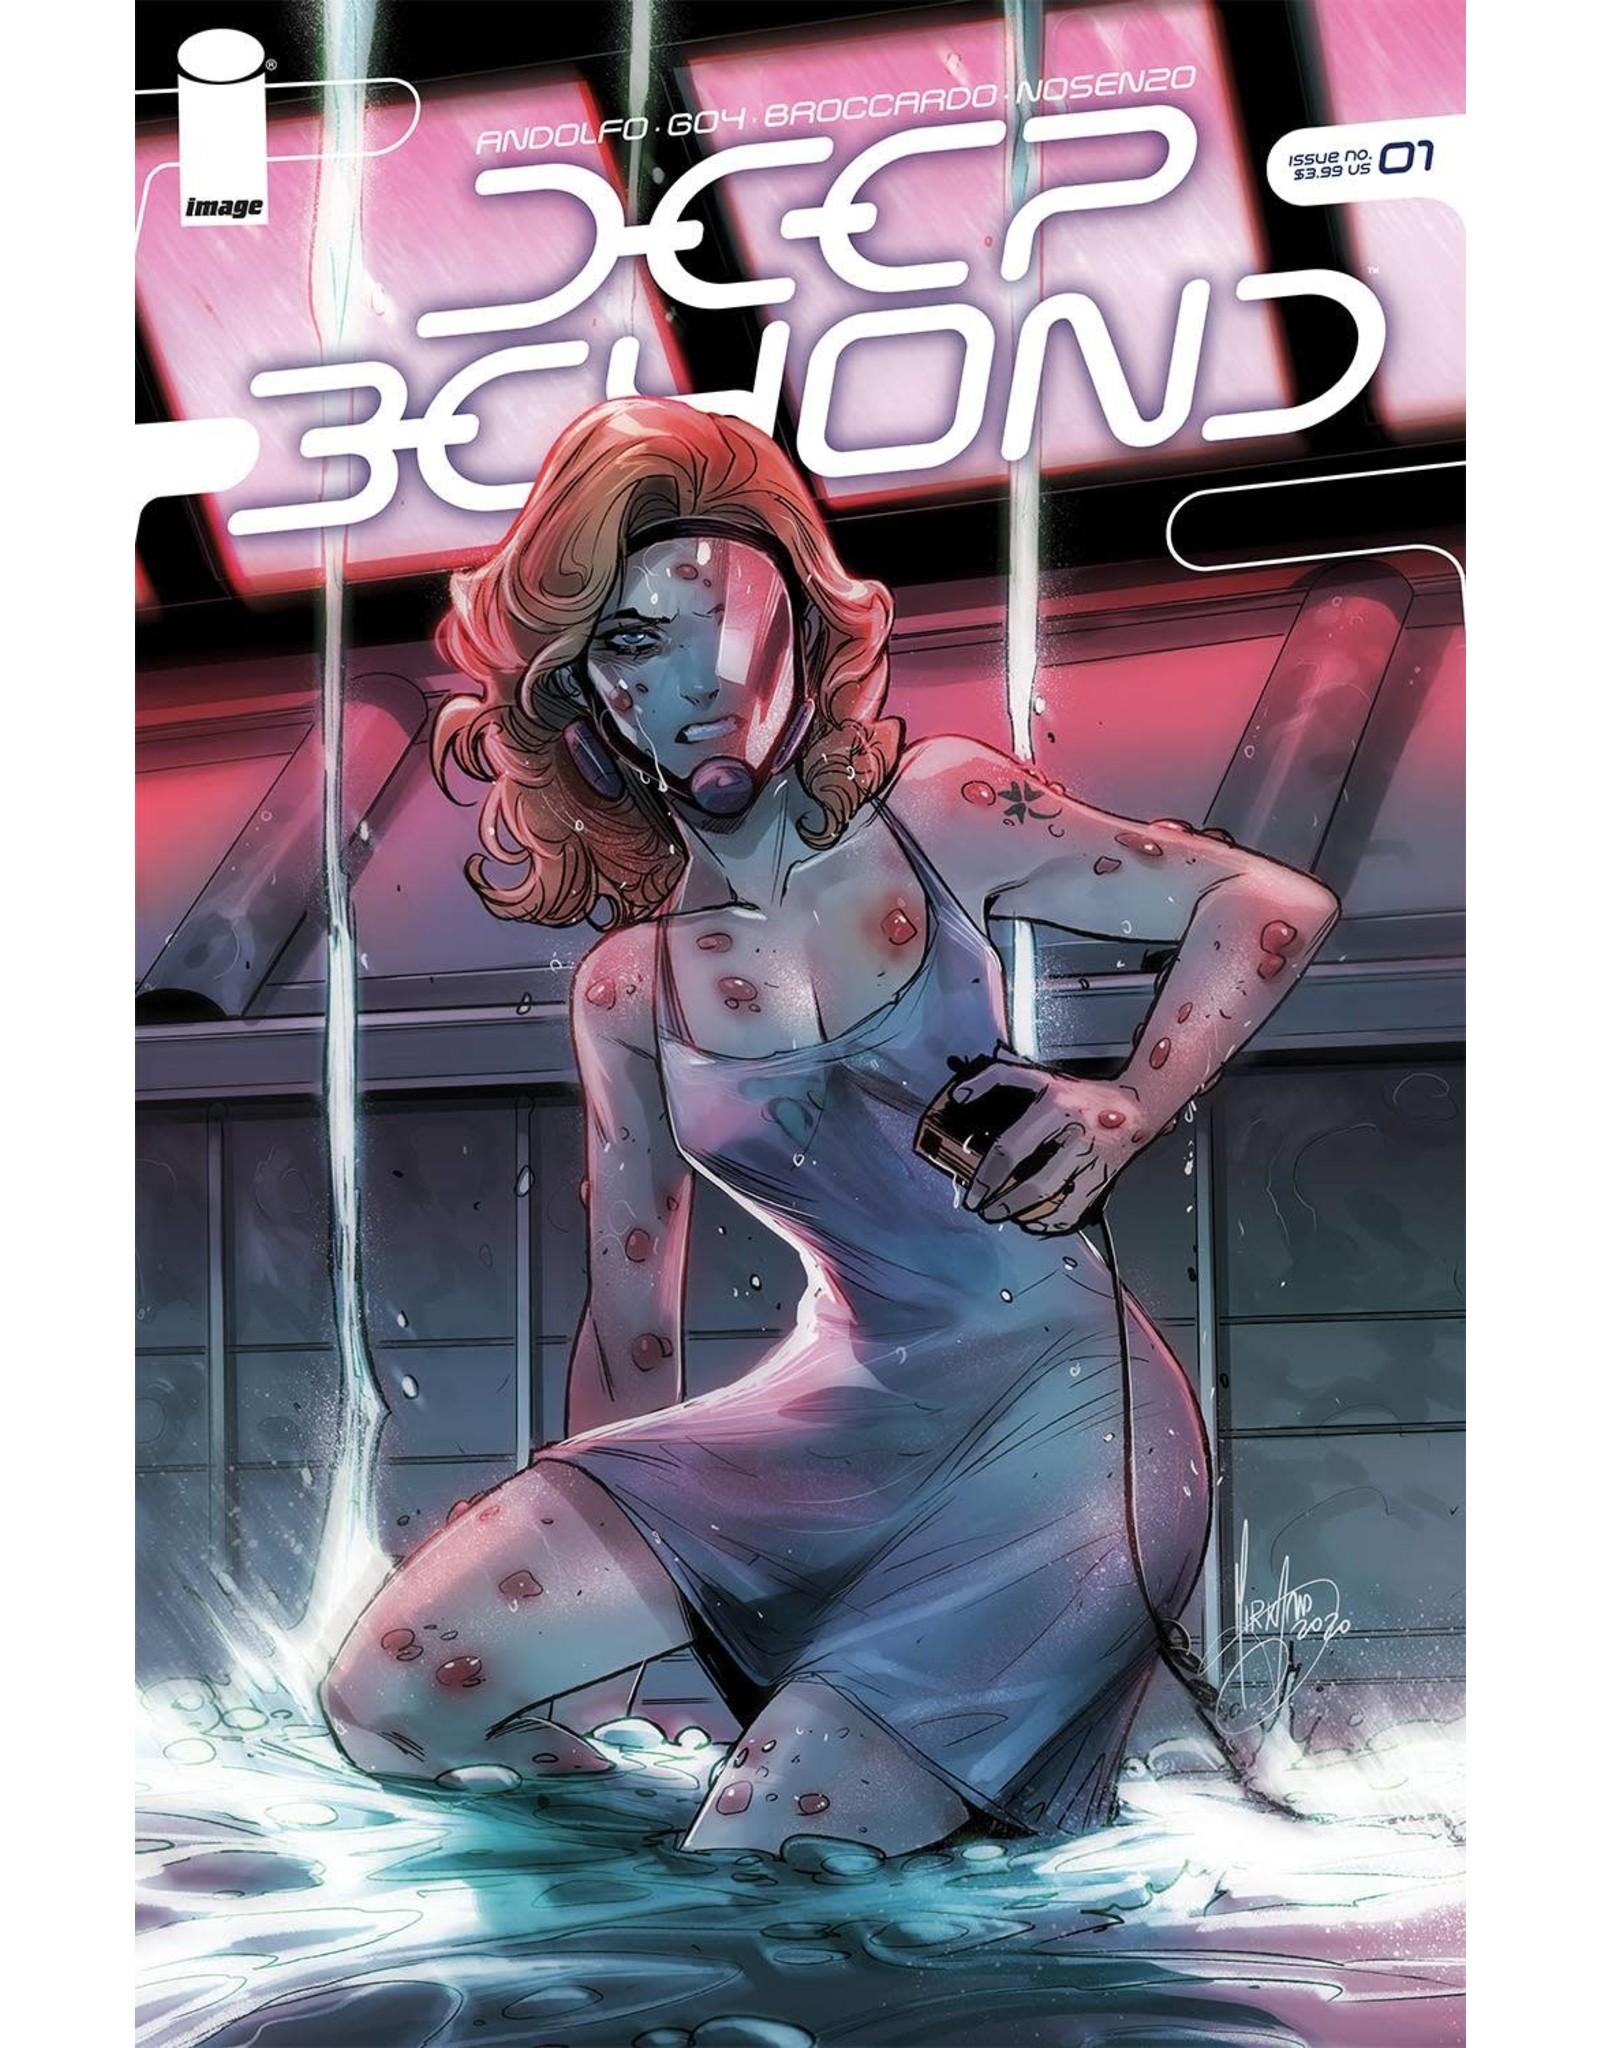 Image Comics DEEP BEYOND #1 (OF 12) CVR B ANDOLFO